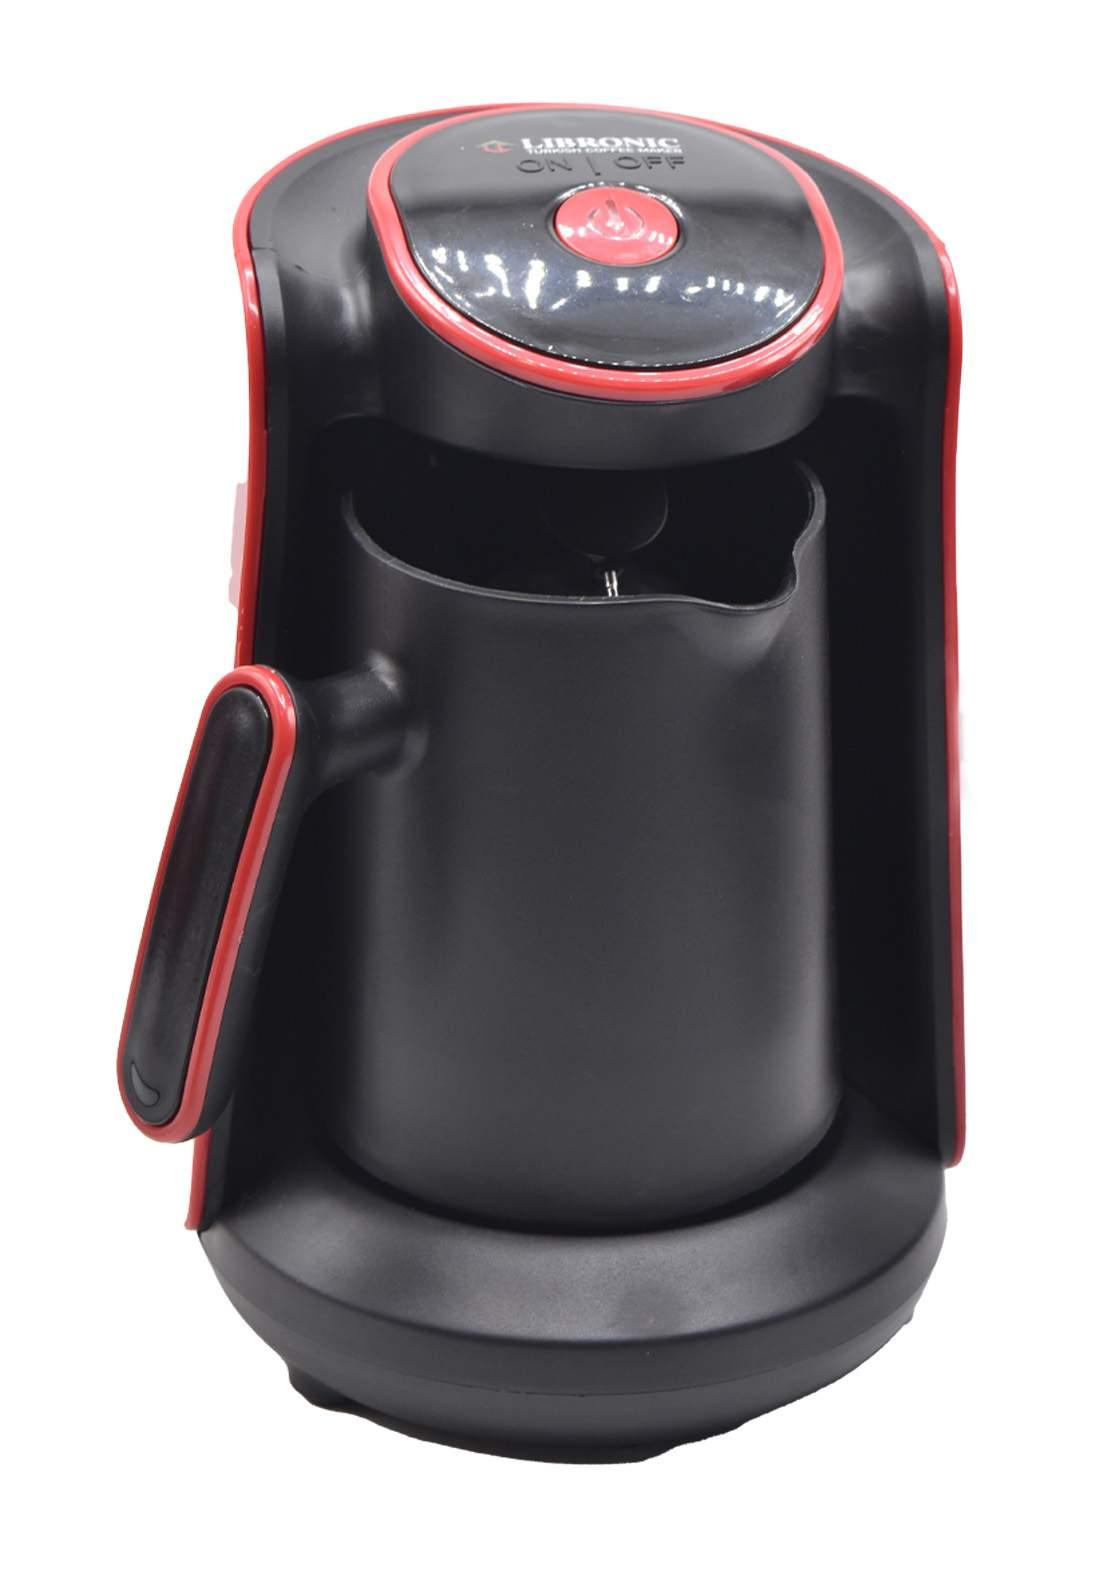 Libronic LC-1017 Coffee Machine ماكنة صنع القهوة